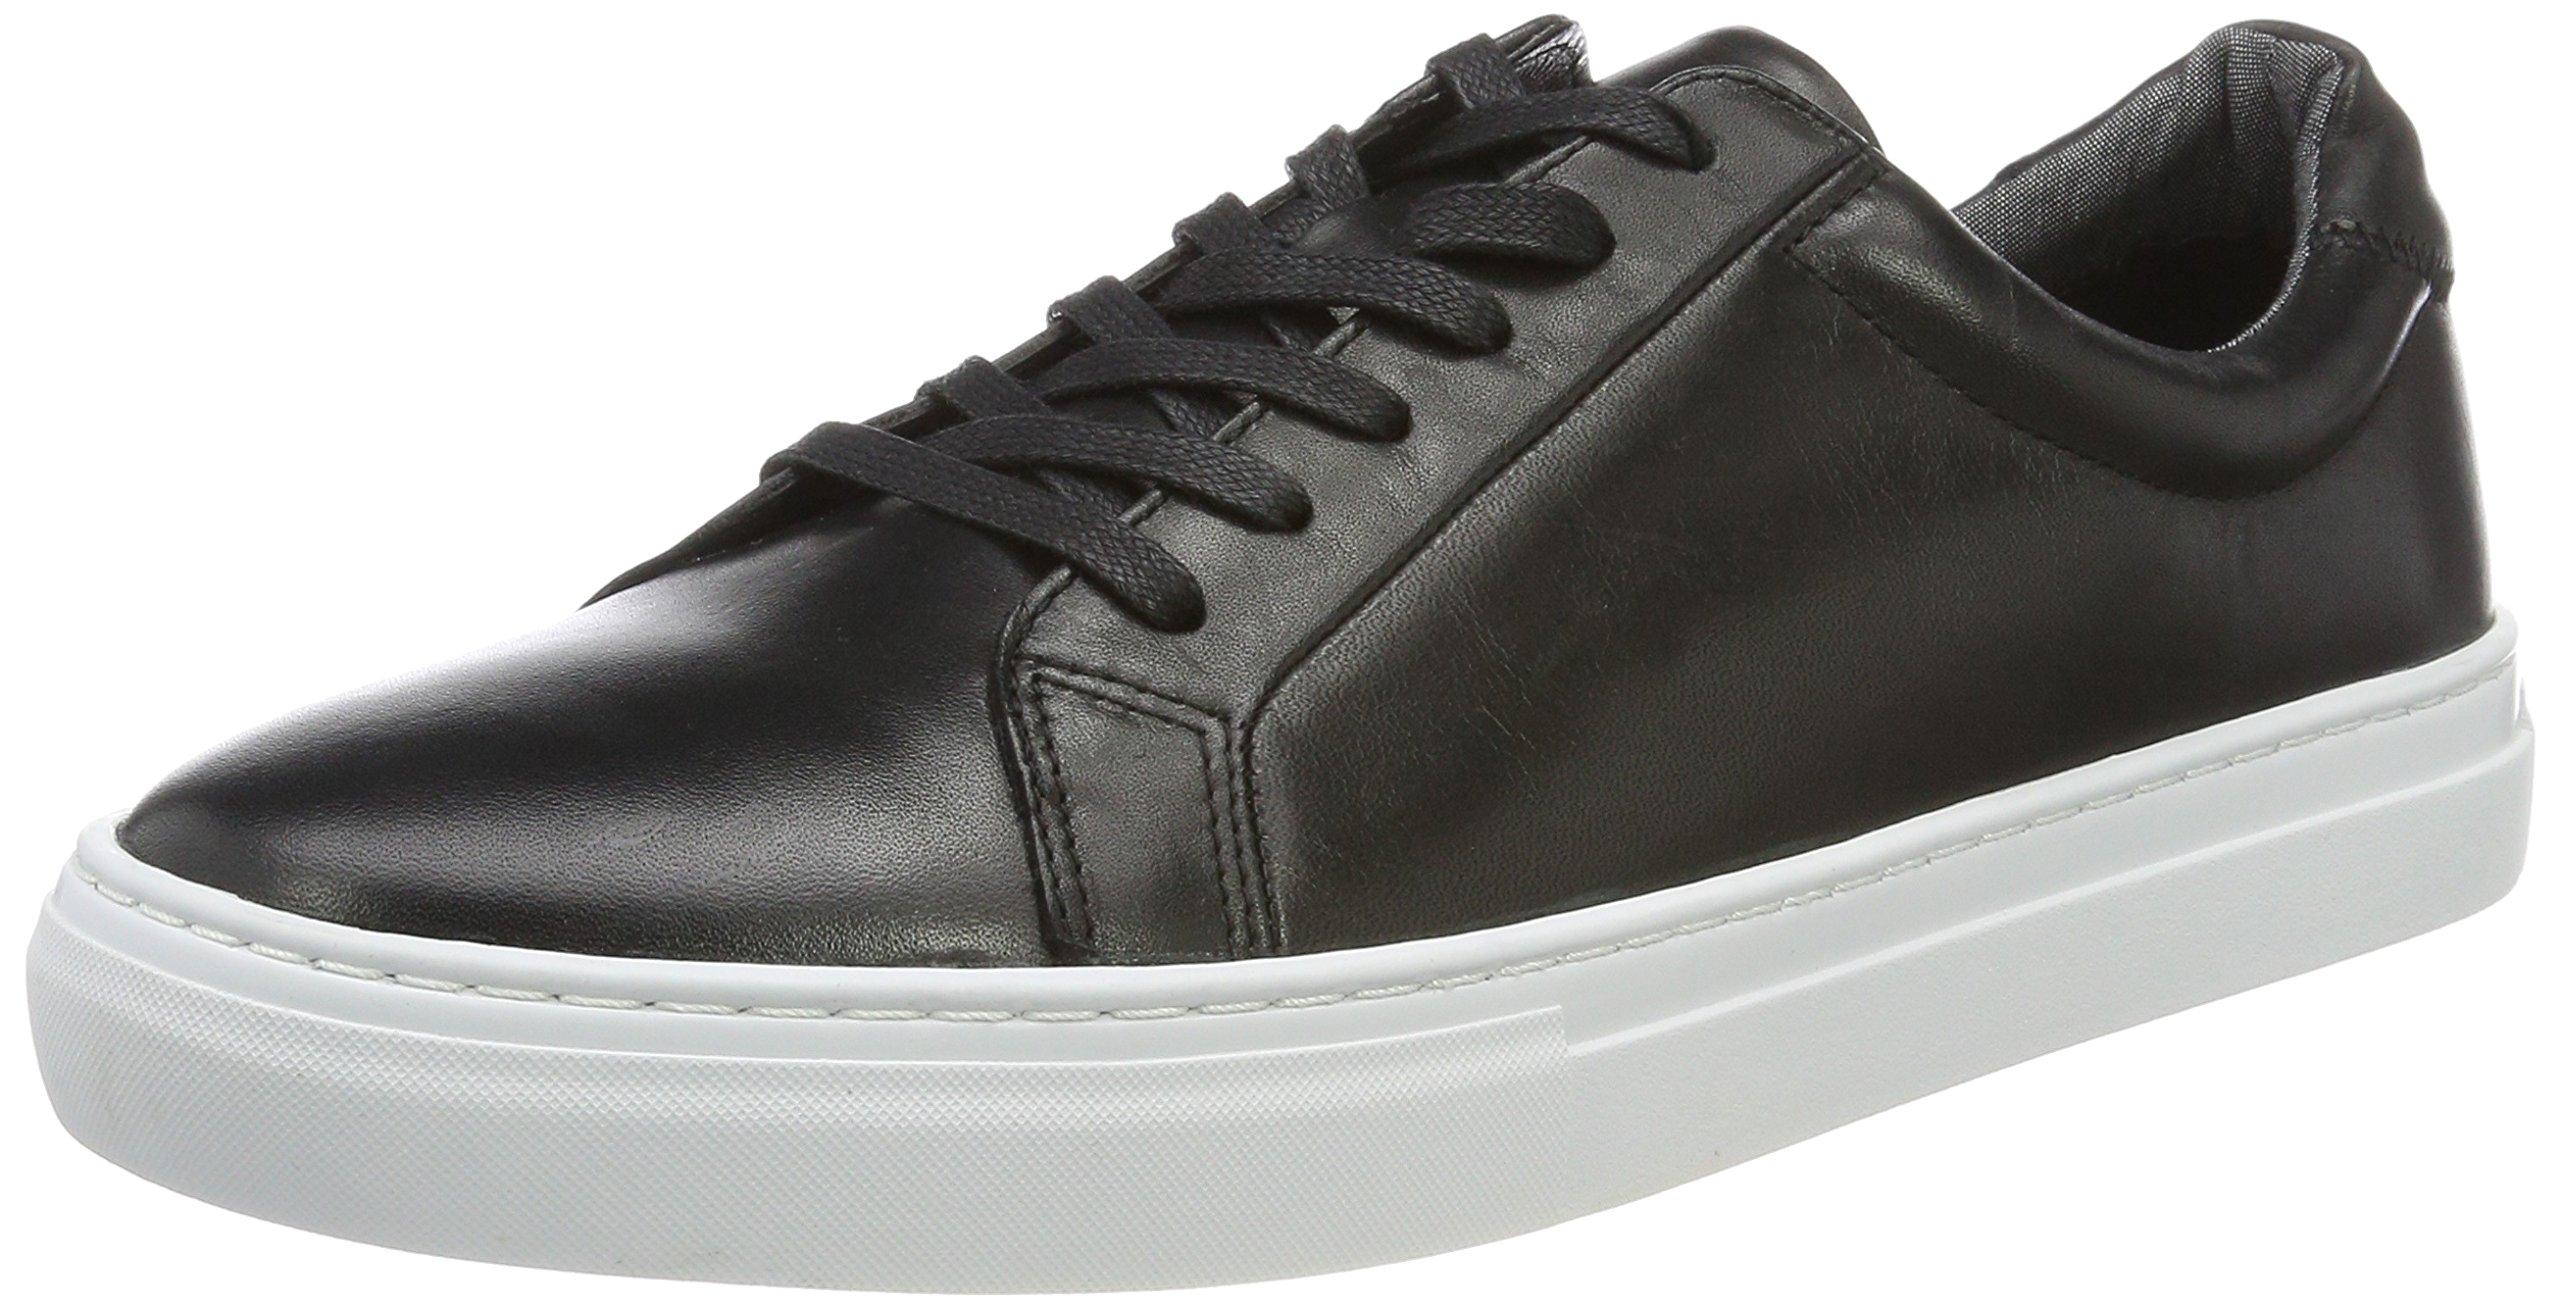 Vagabond Basses Eu HommeNoirblack PaulSneakers 2042 XPOkZTiu